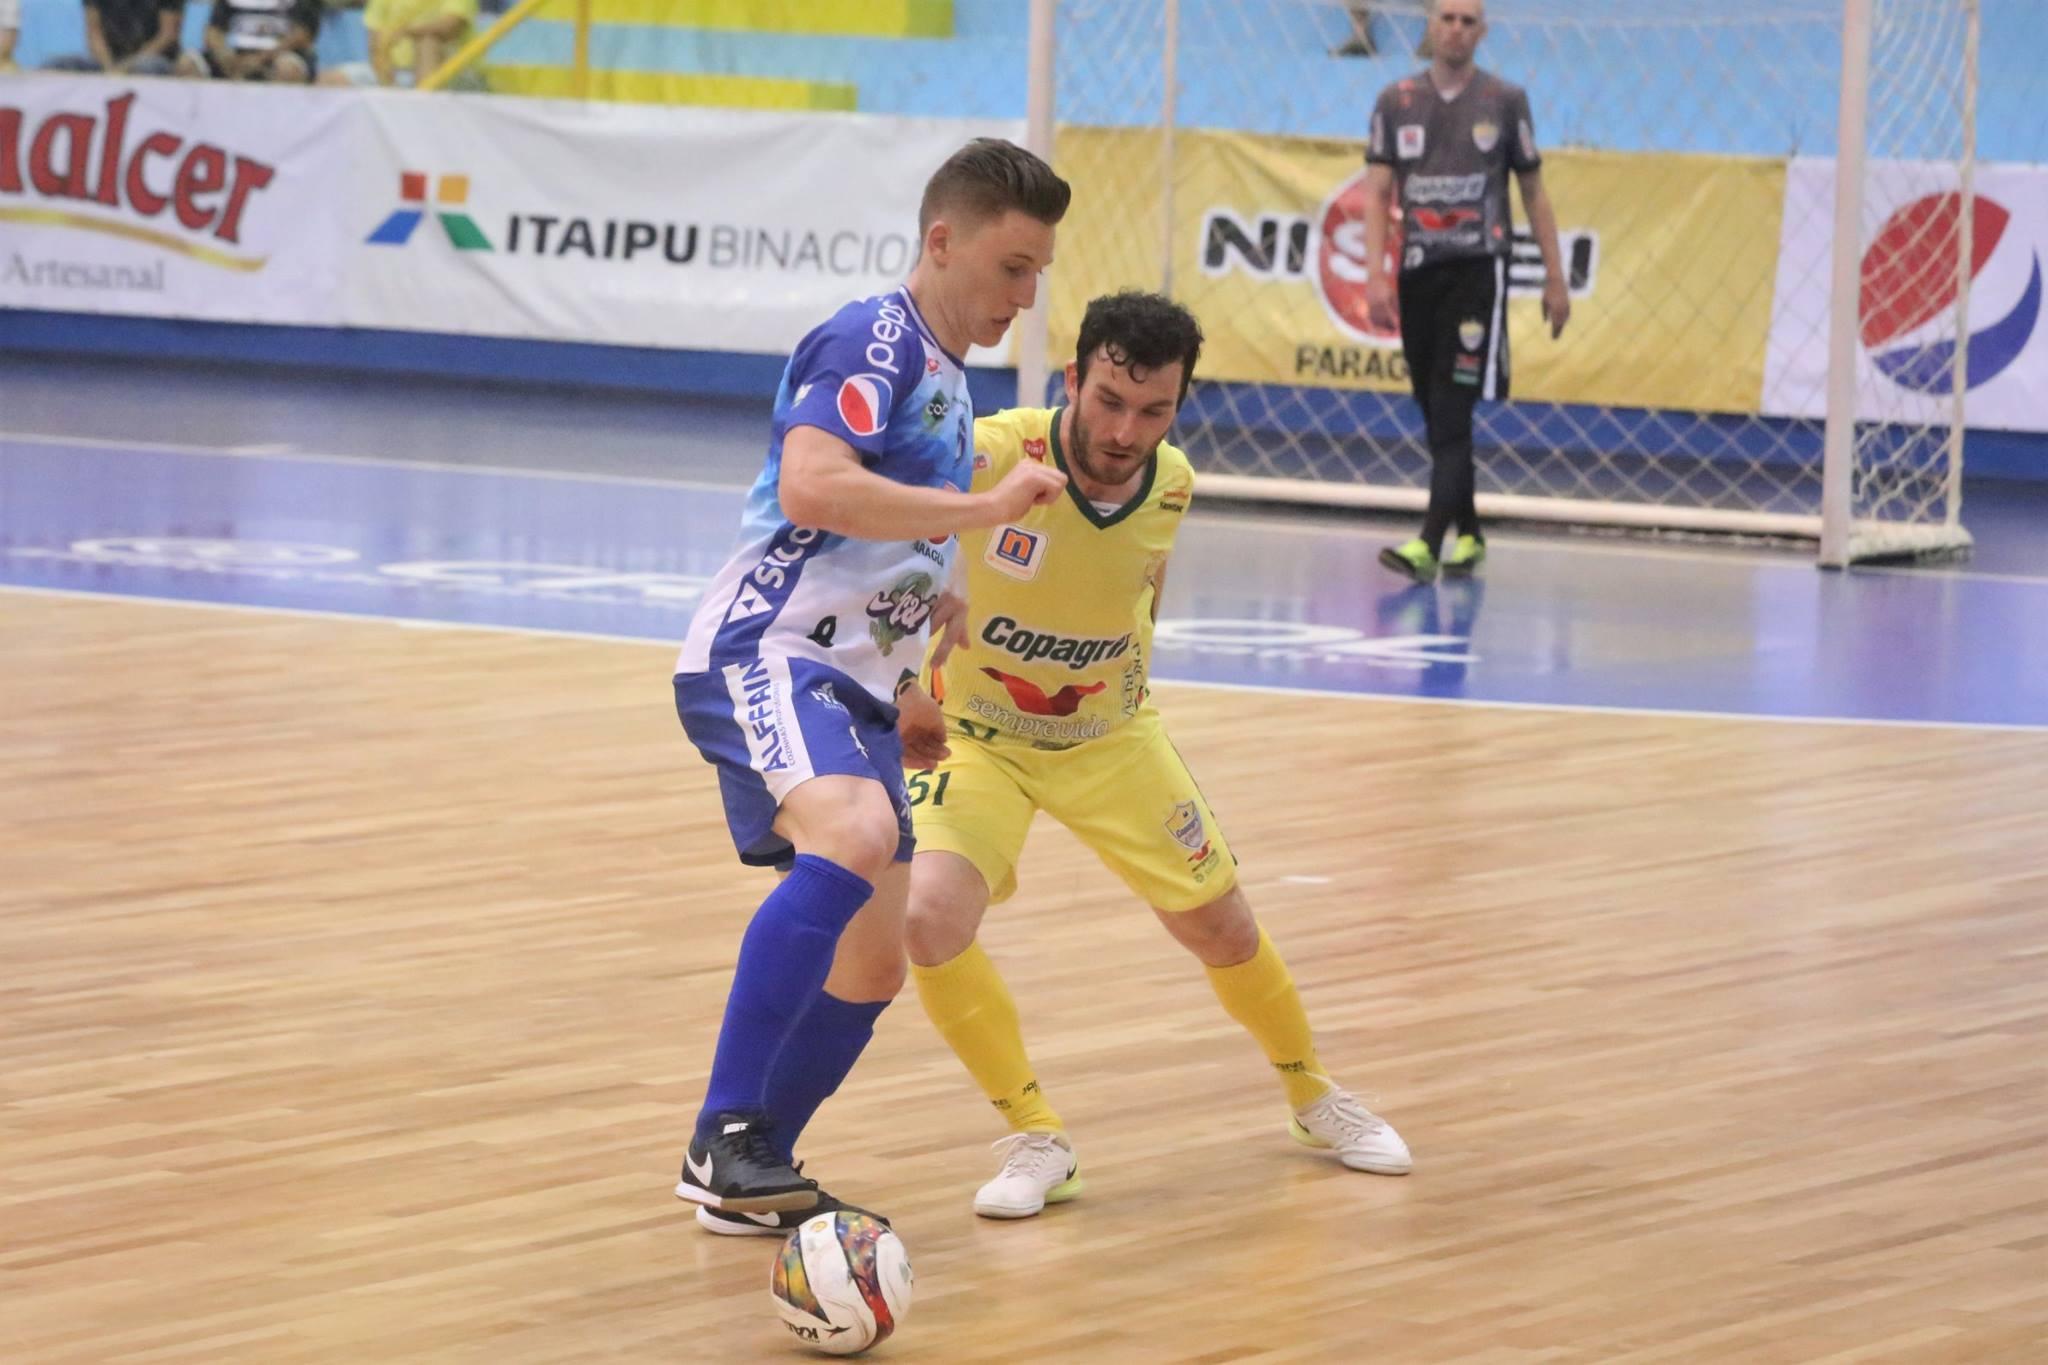 Foz Cataratas Futsal vence de virada o Copagril - Clickfoz do Iguaçu 80ee4a8ed76aa